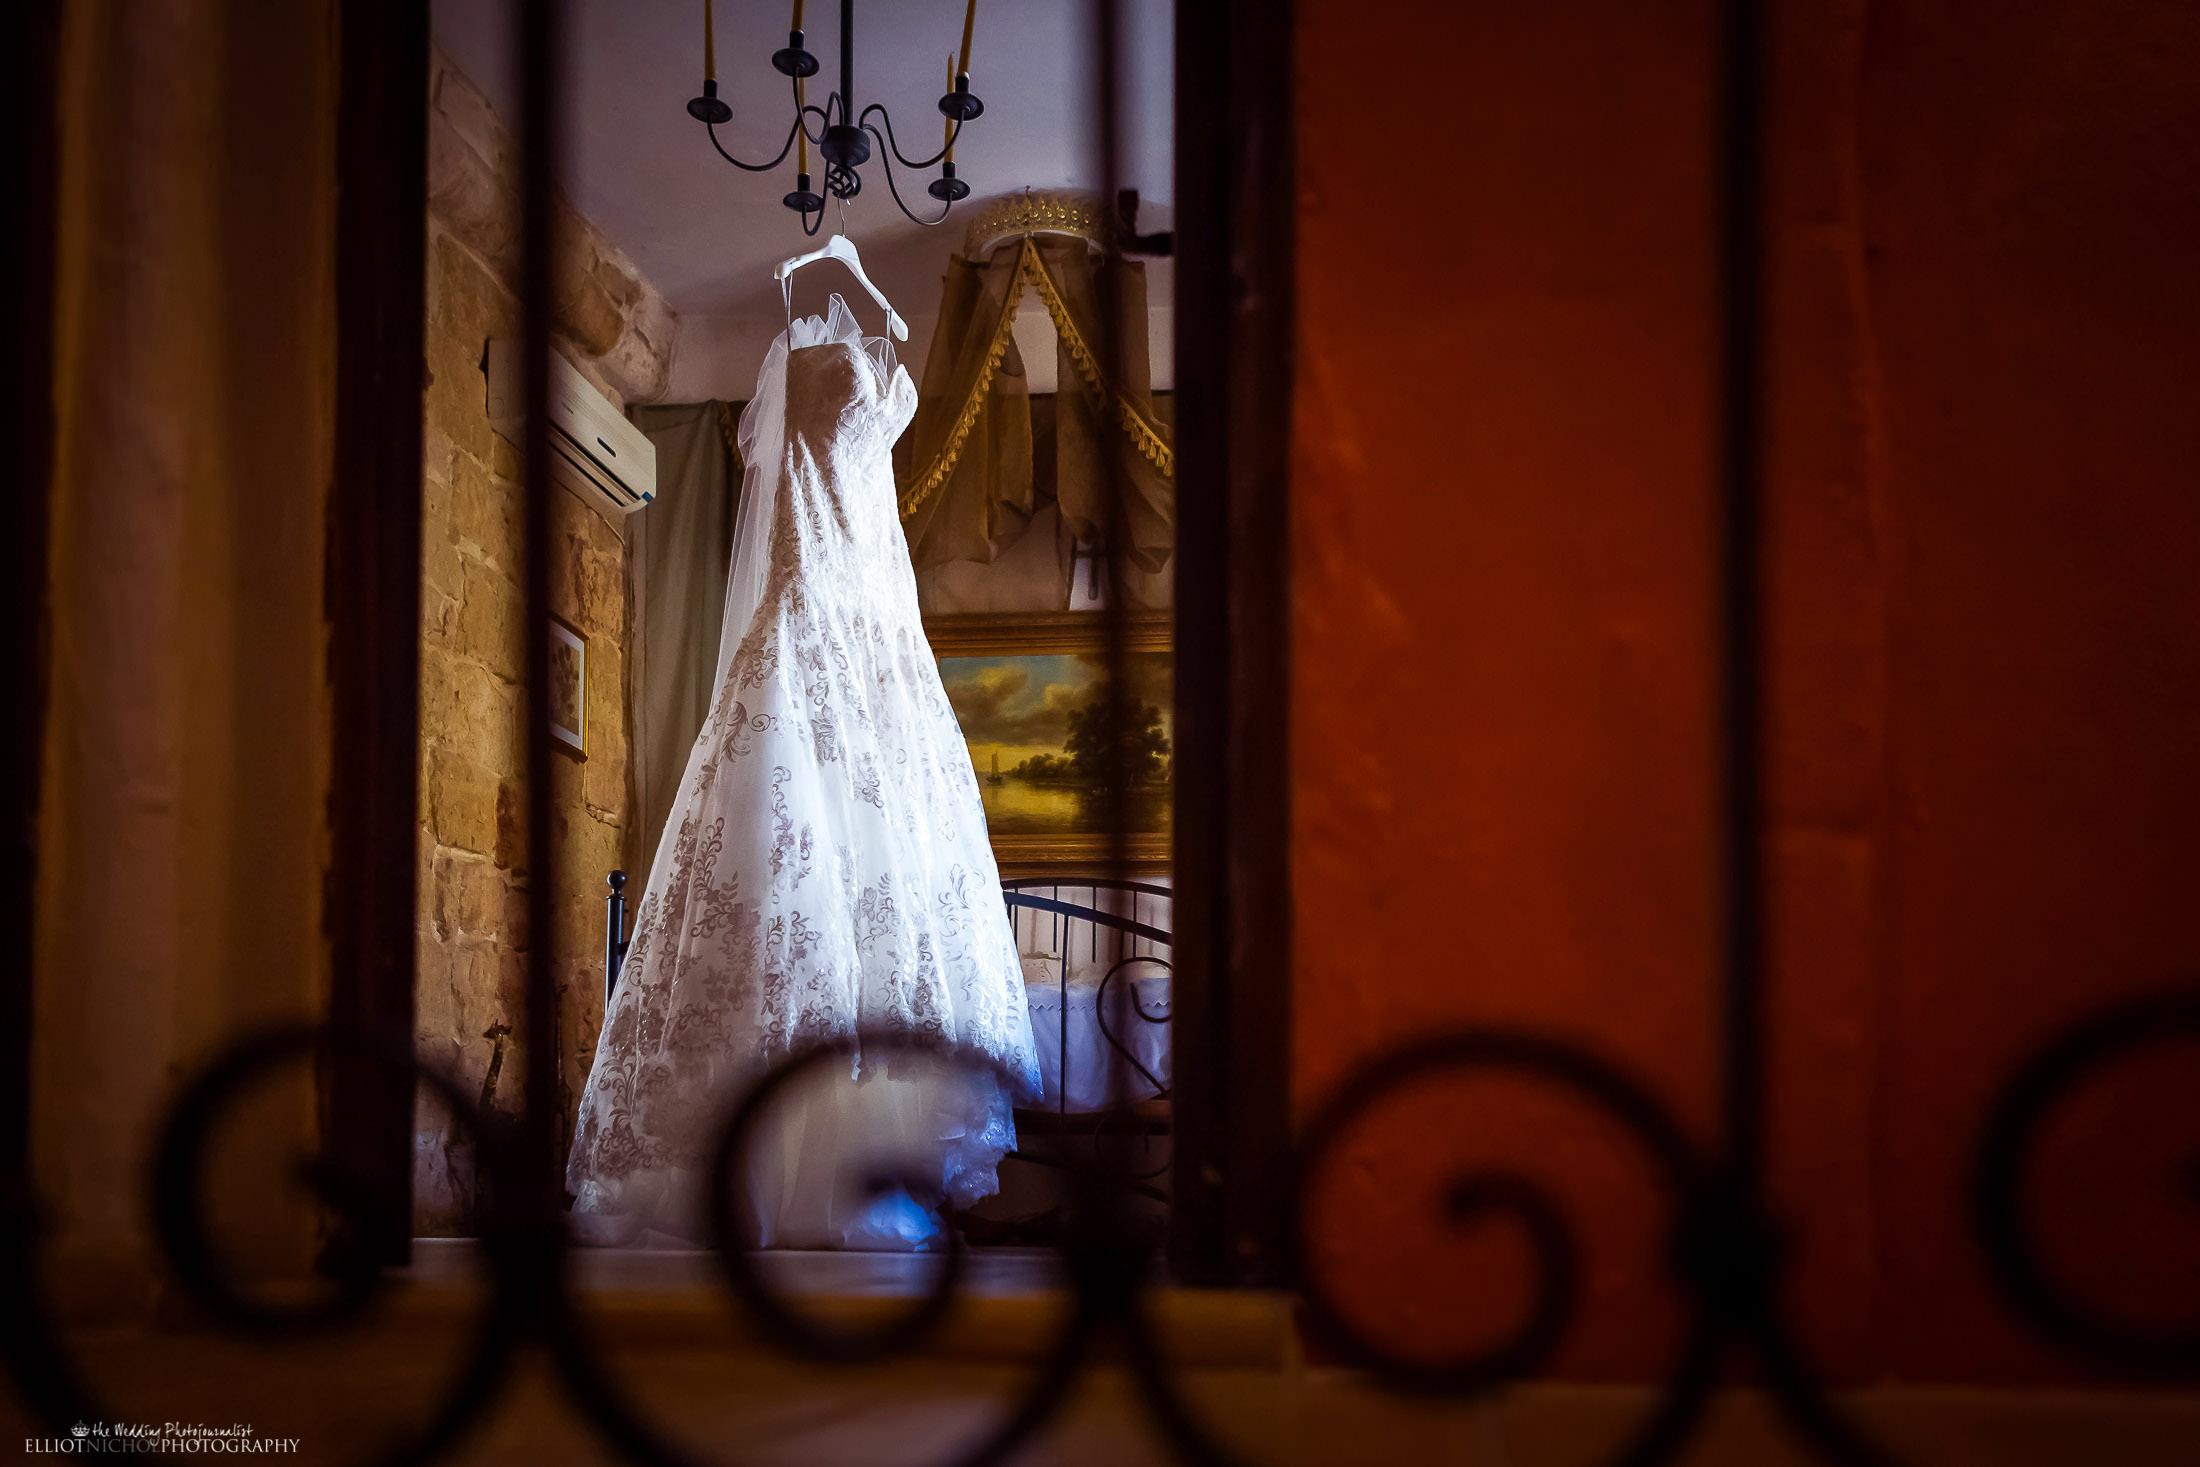 Brides wedding dress detail. Photo by Elliot Nichol Photography.